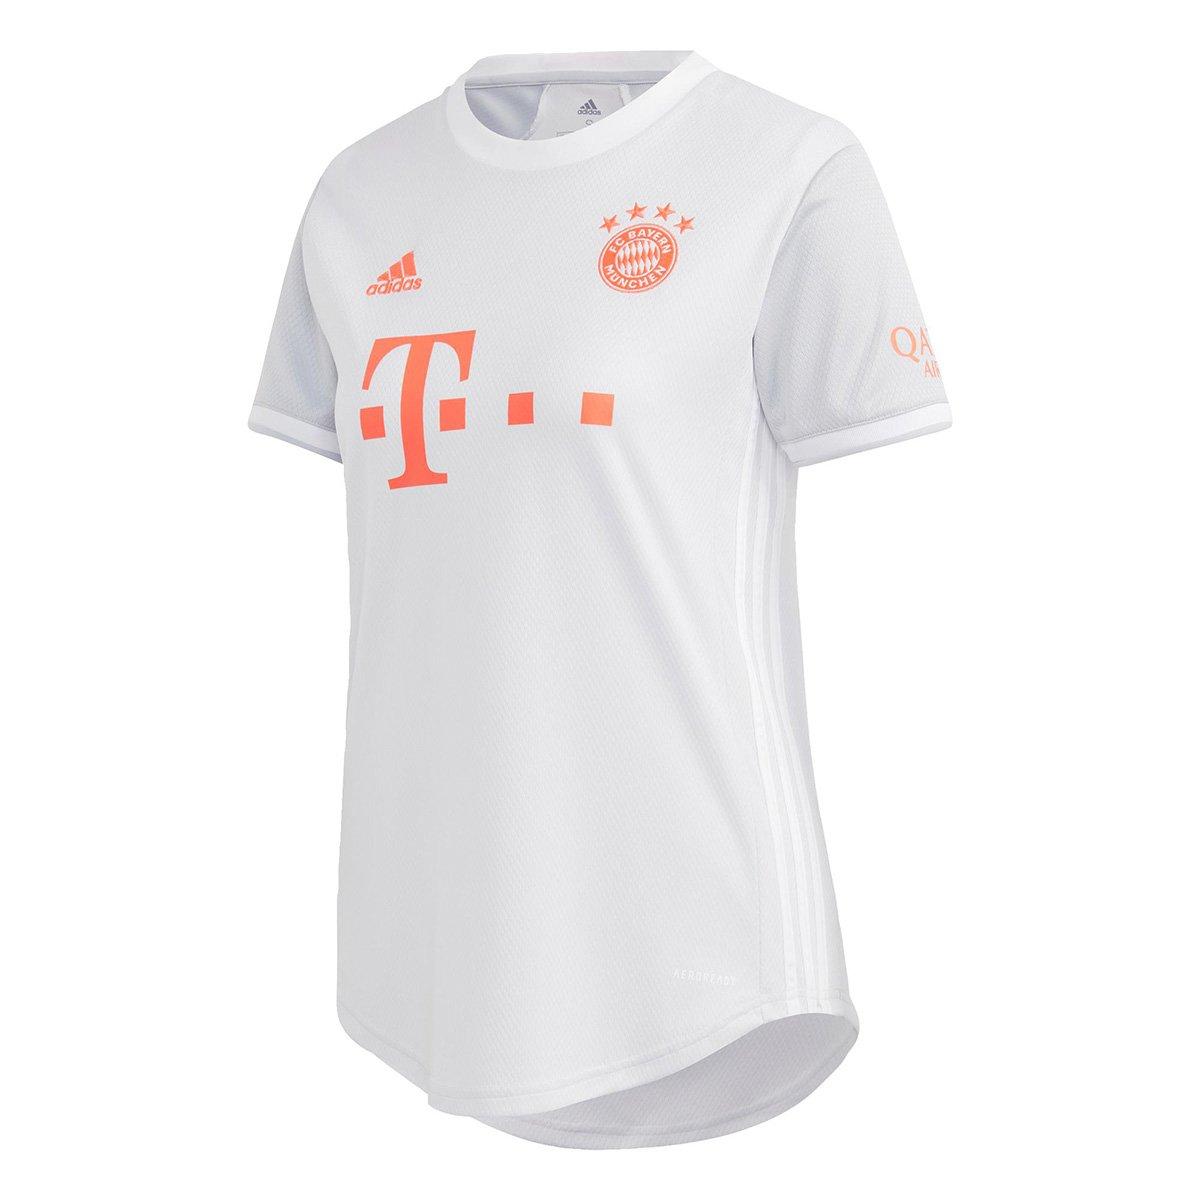 Camisa Bayern de Munique Away 20/21 s/n° Torcedor Adidas Feminina